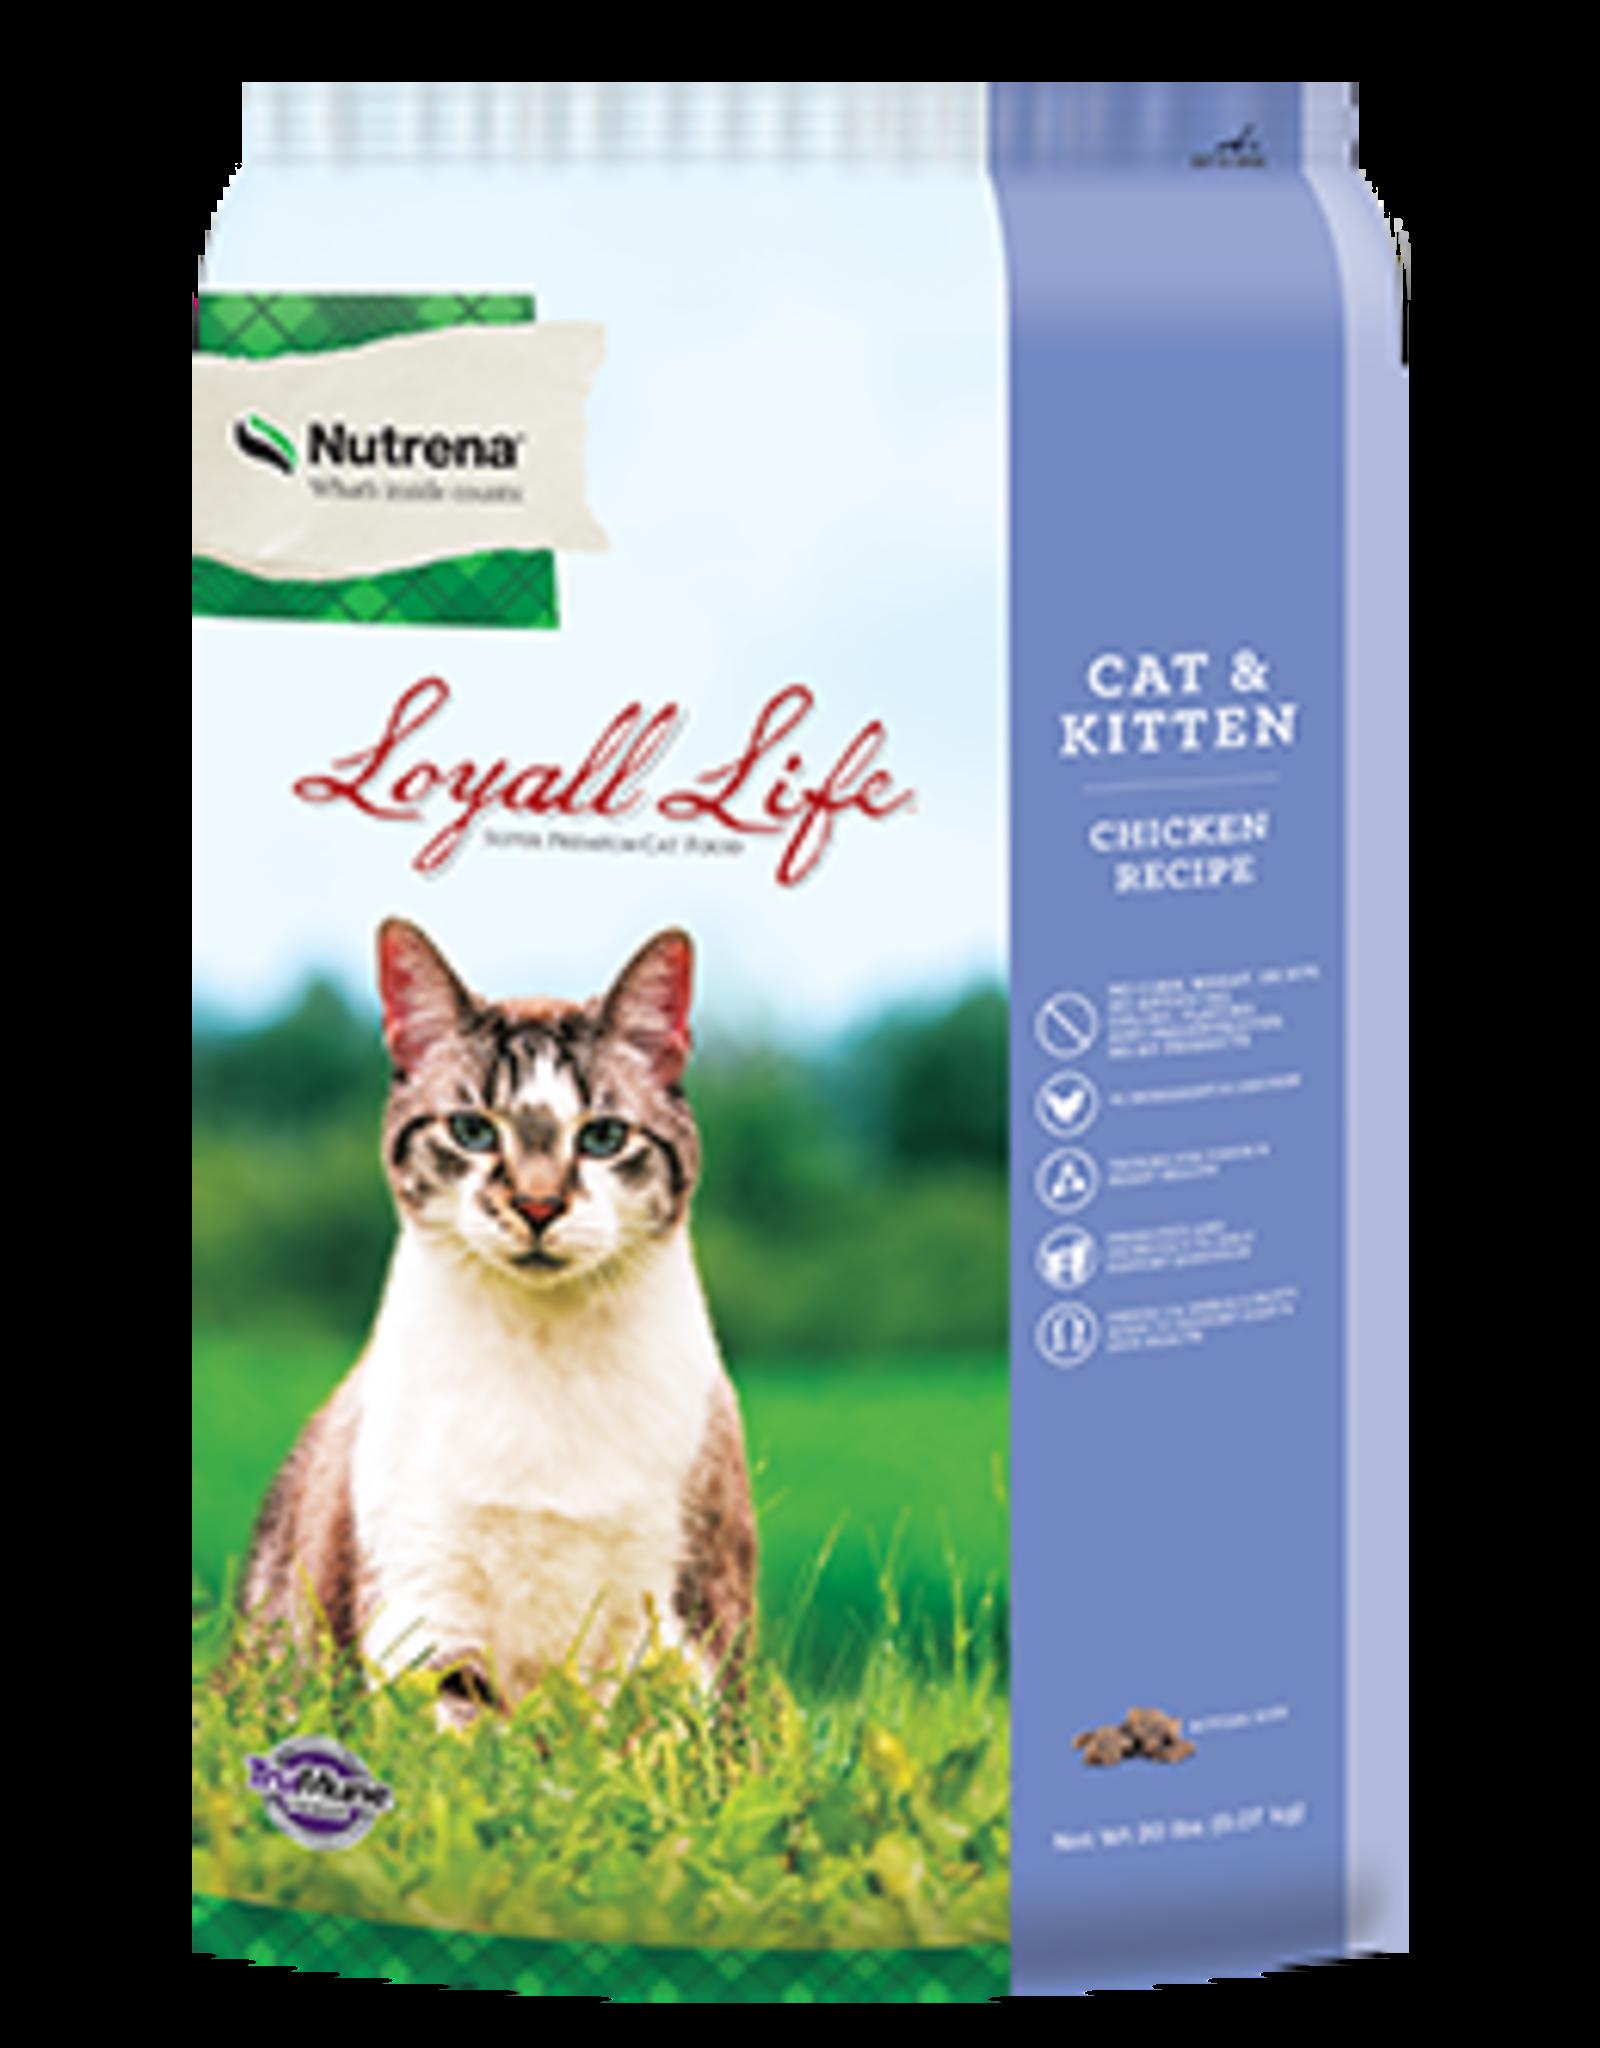 Loyall life Cat & Kitten 20lb